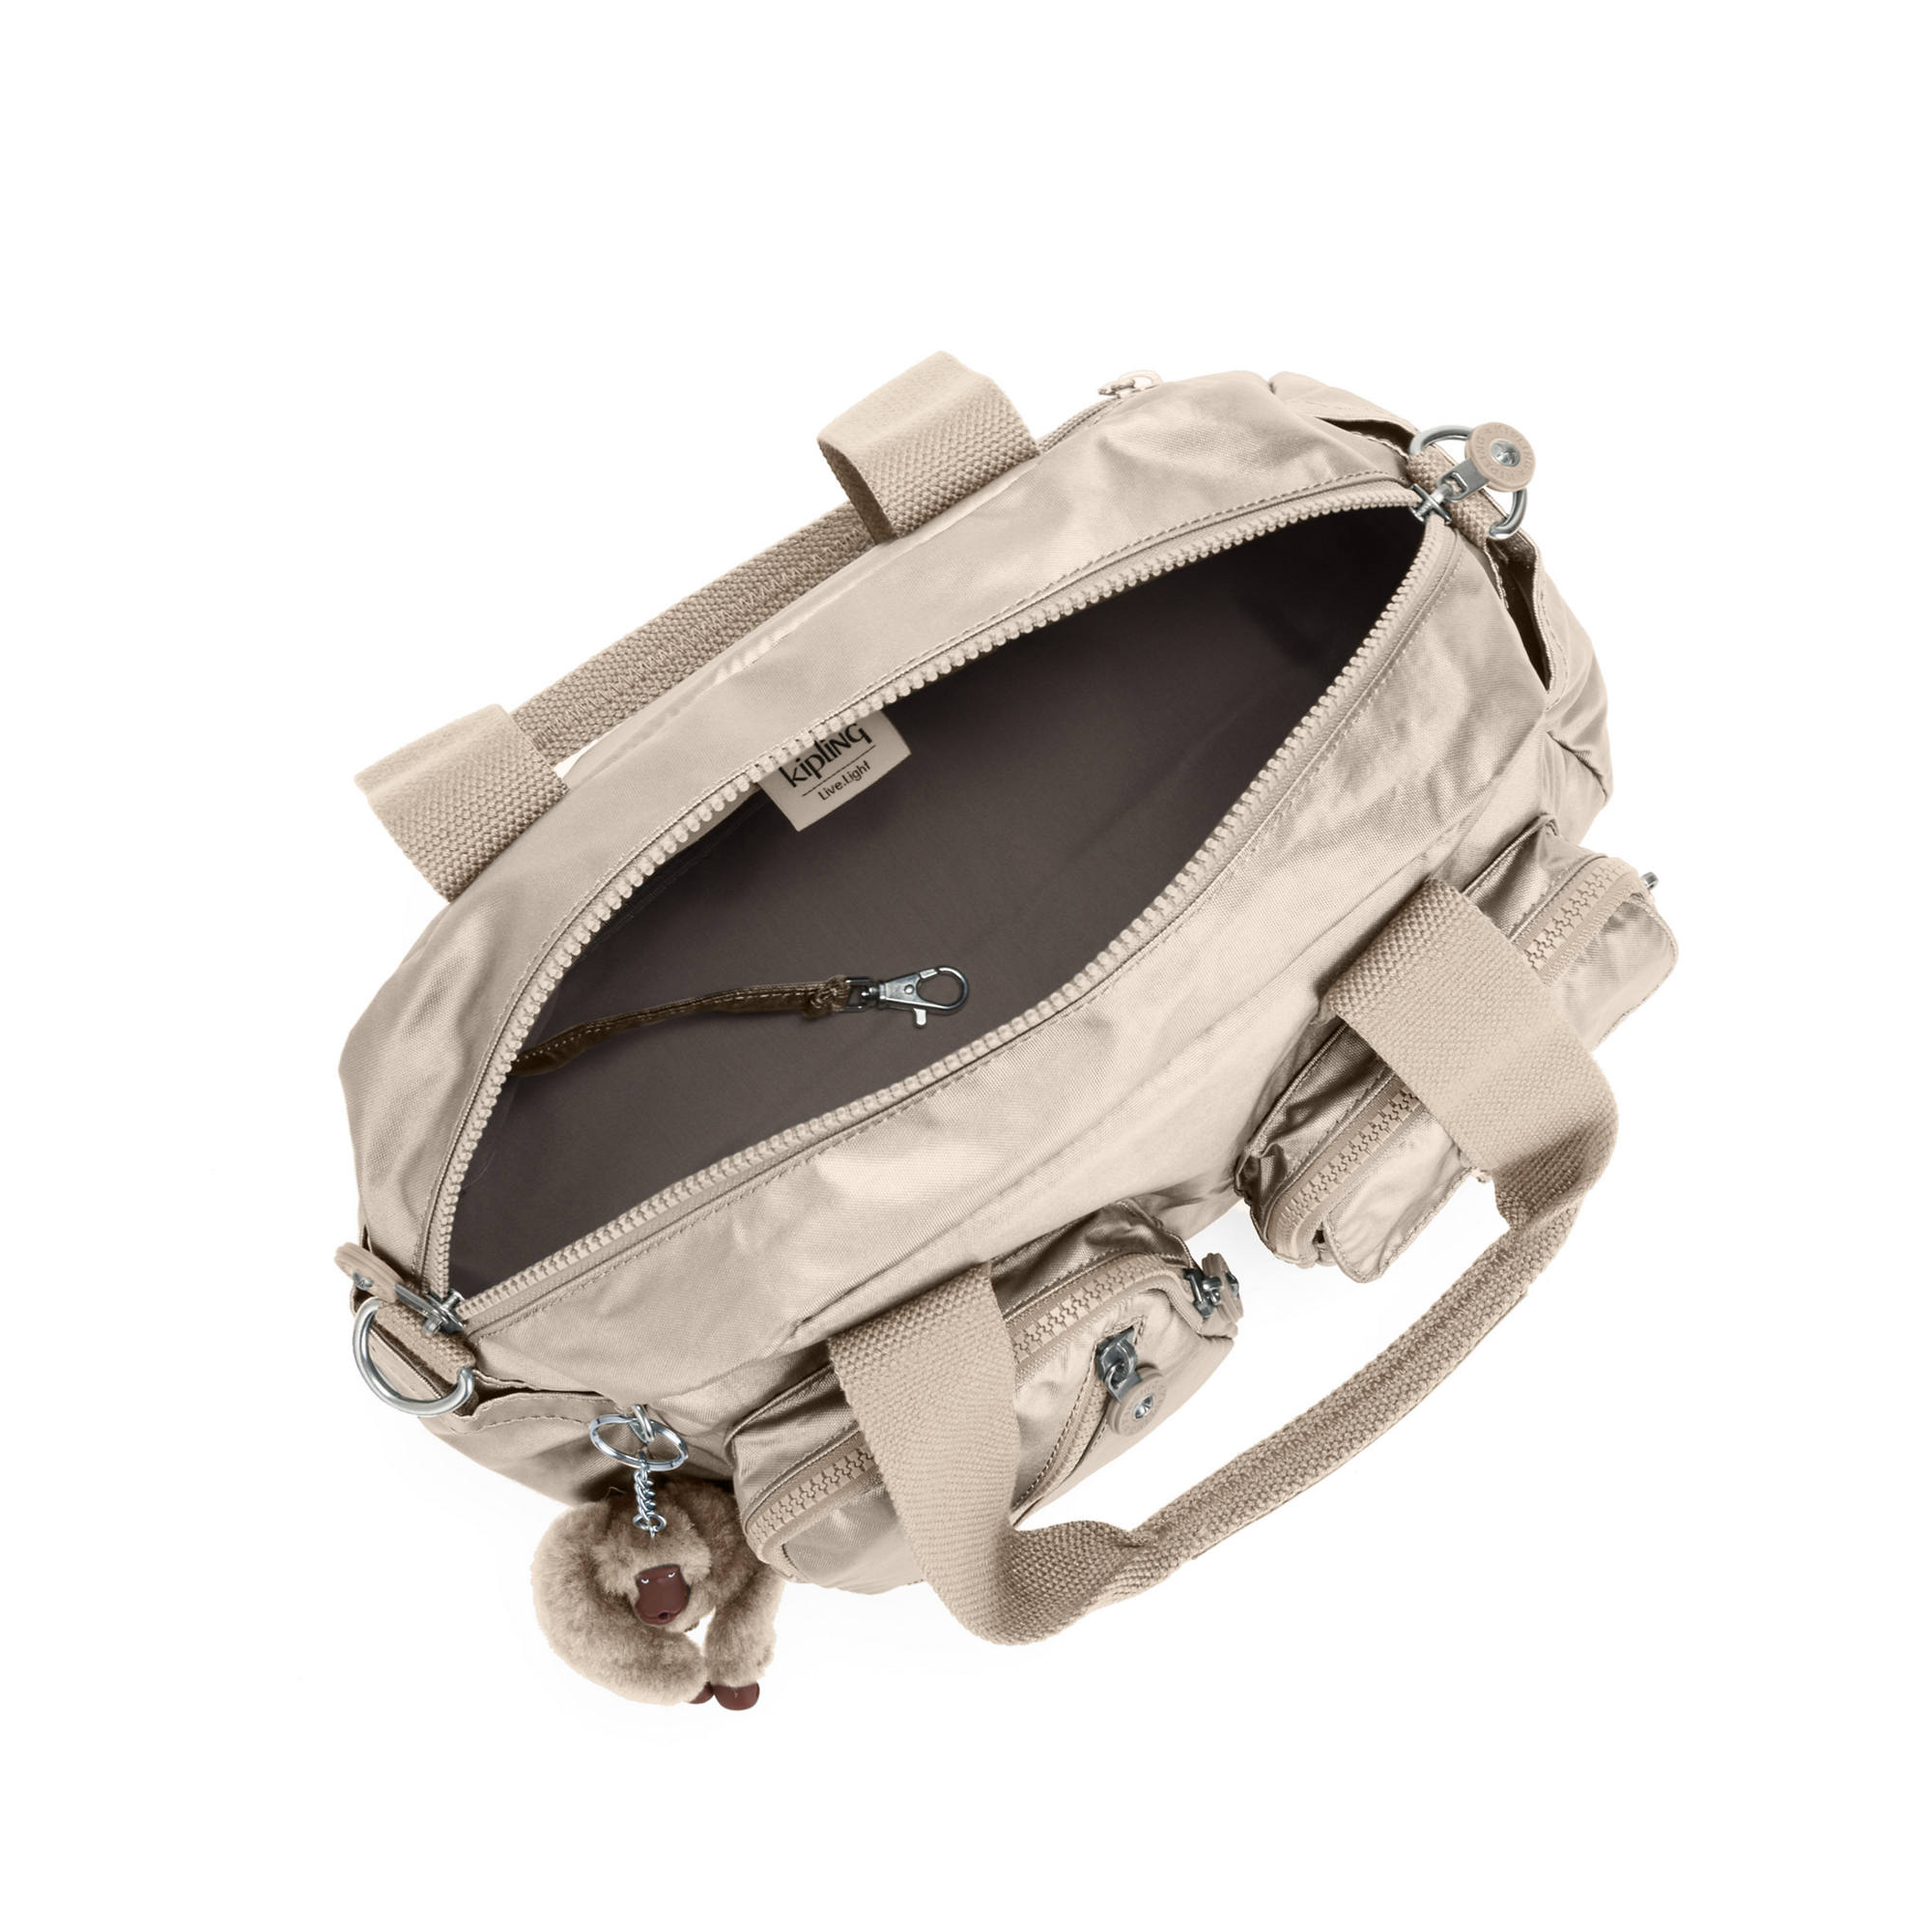 Kipling-Defea-Handbag miniatura 10